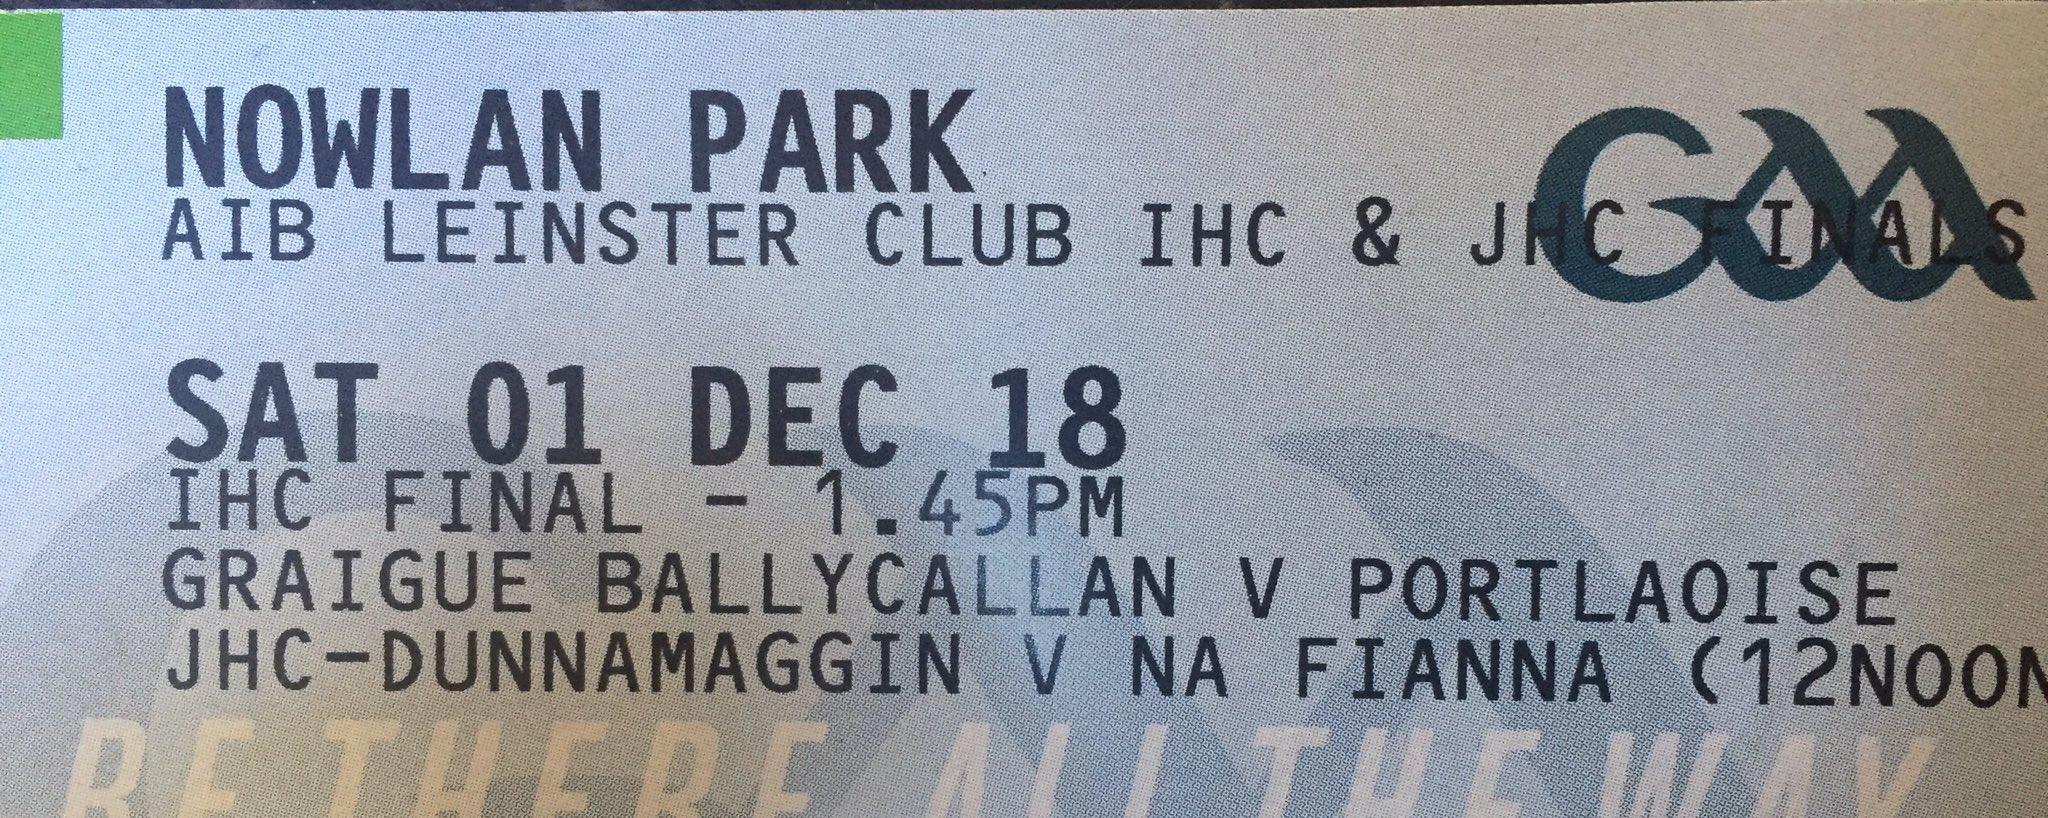 The 2018 Leinster Intermediate & Junior Finals. Photo: @dunnamaggingaa/Twitter